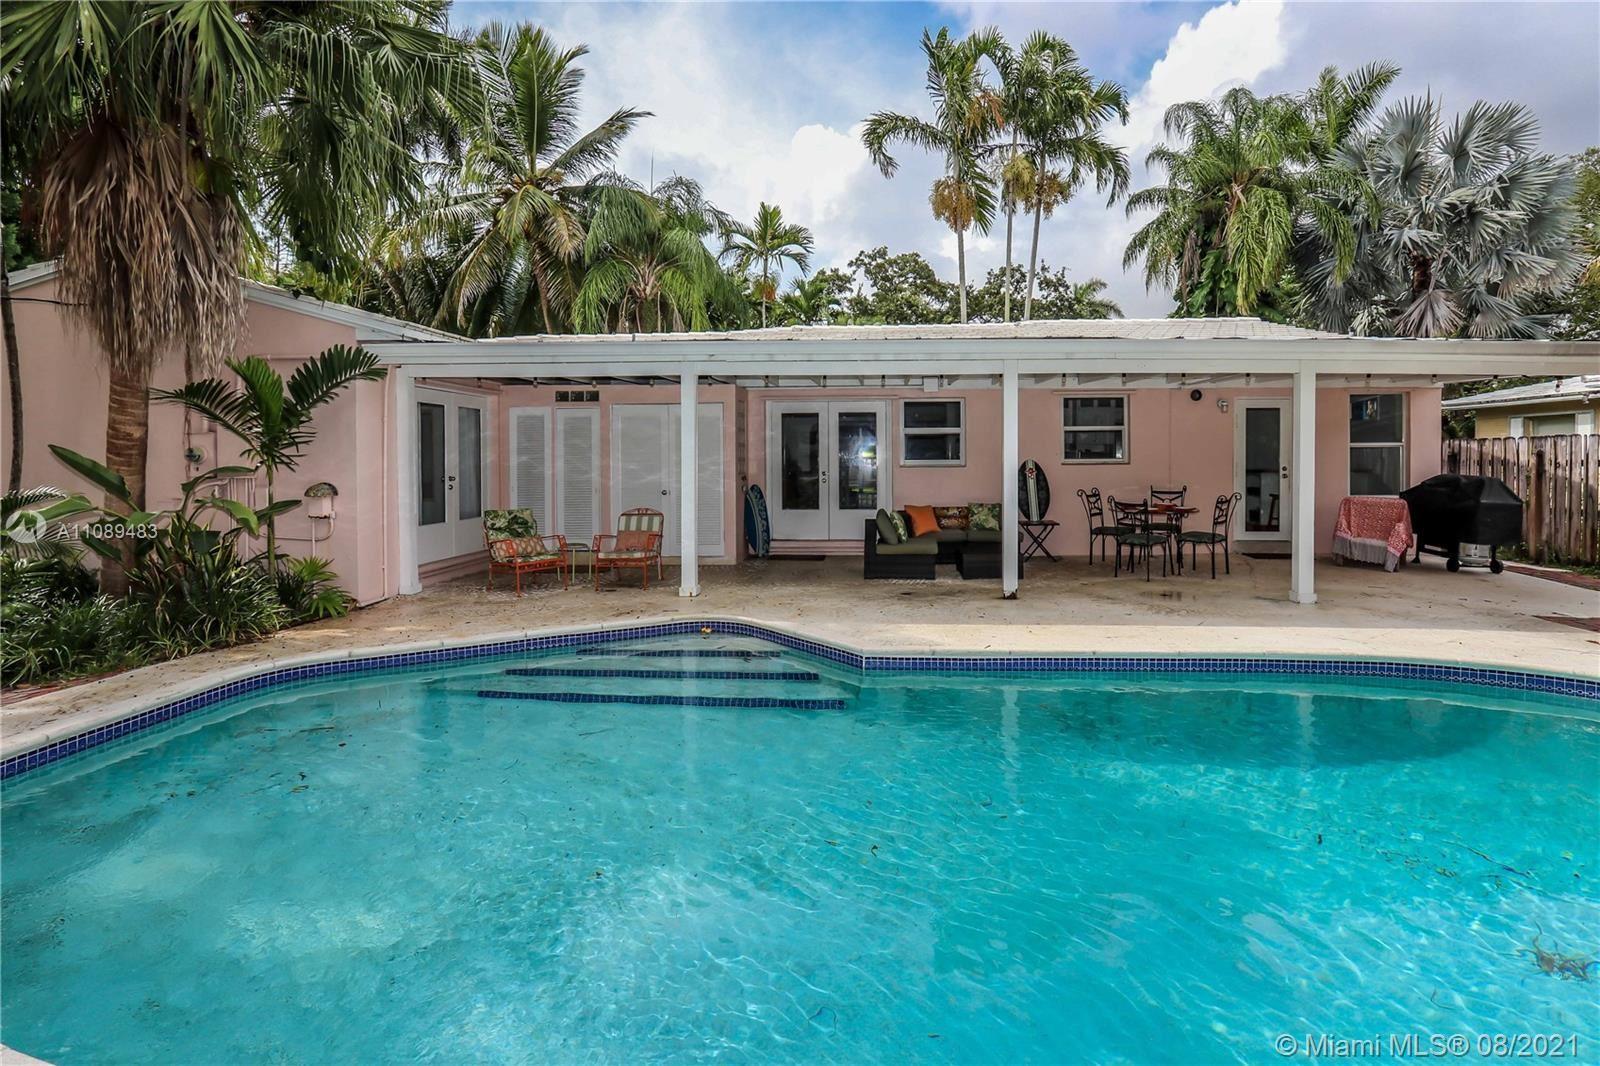 1343 Monroe St, Hollywood, FL 33019 - #: A11089483